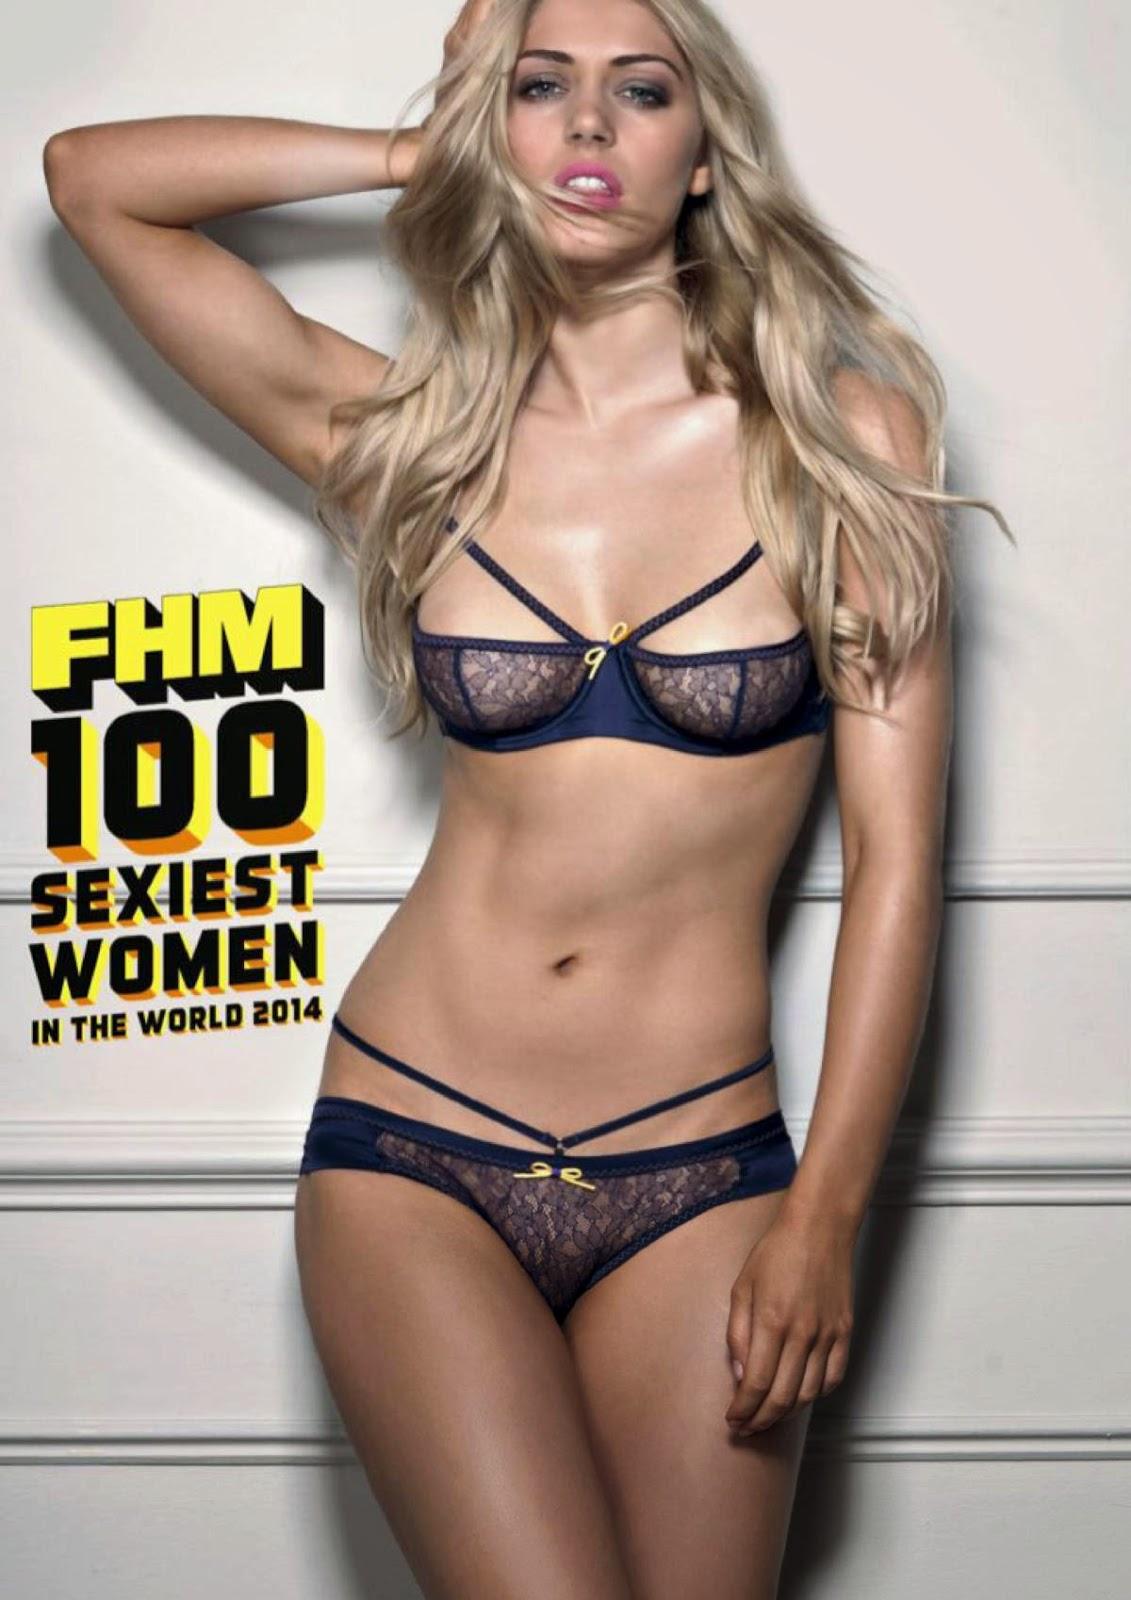 FHM 100 Sexiest Women of 2014   Hot Celebs